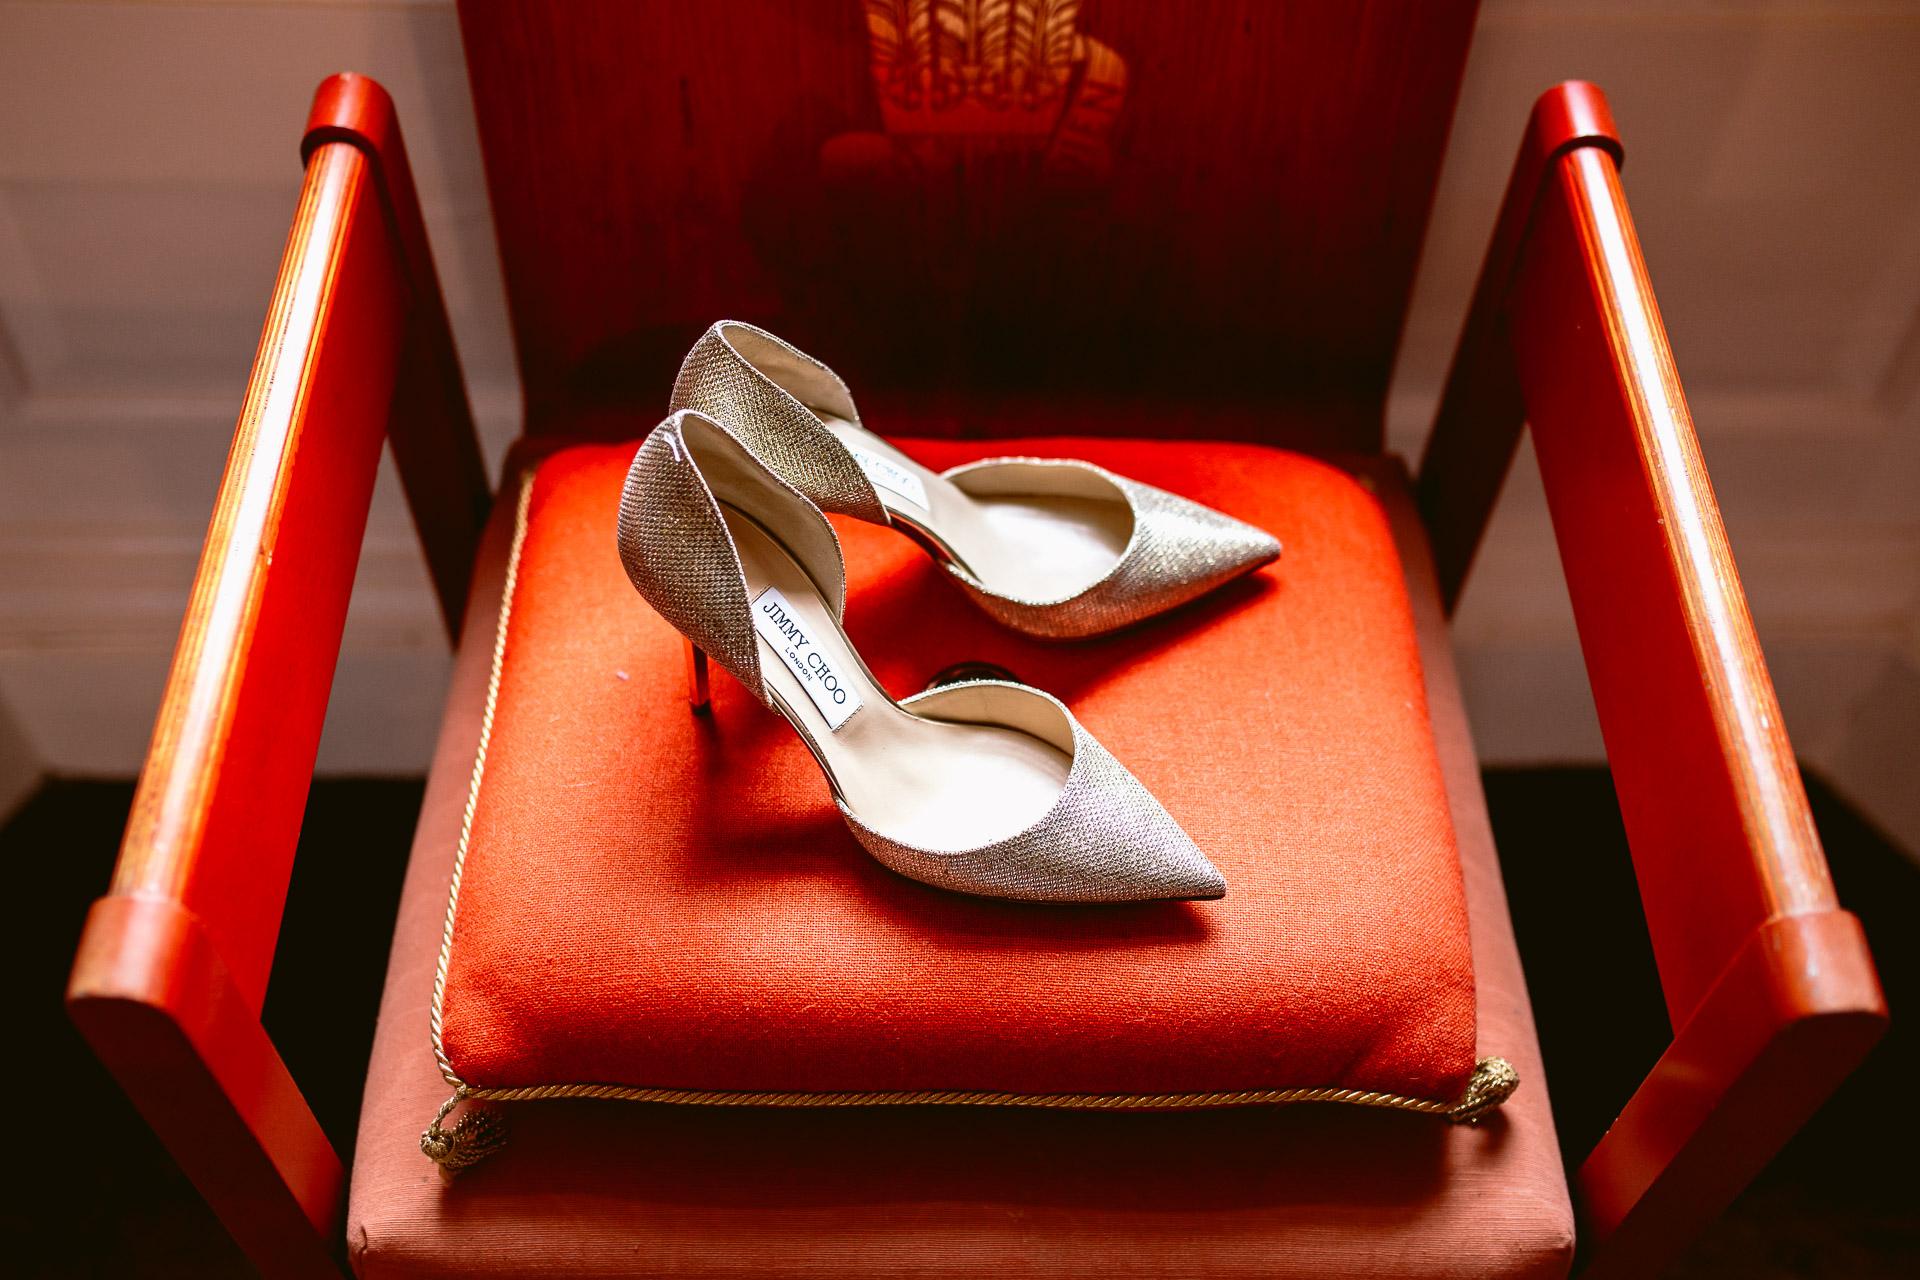 bridal shoes Jimmy Choo standing on the orange cushion in Fonmon Castle